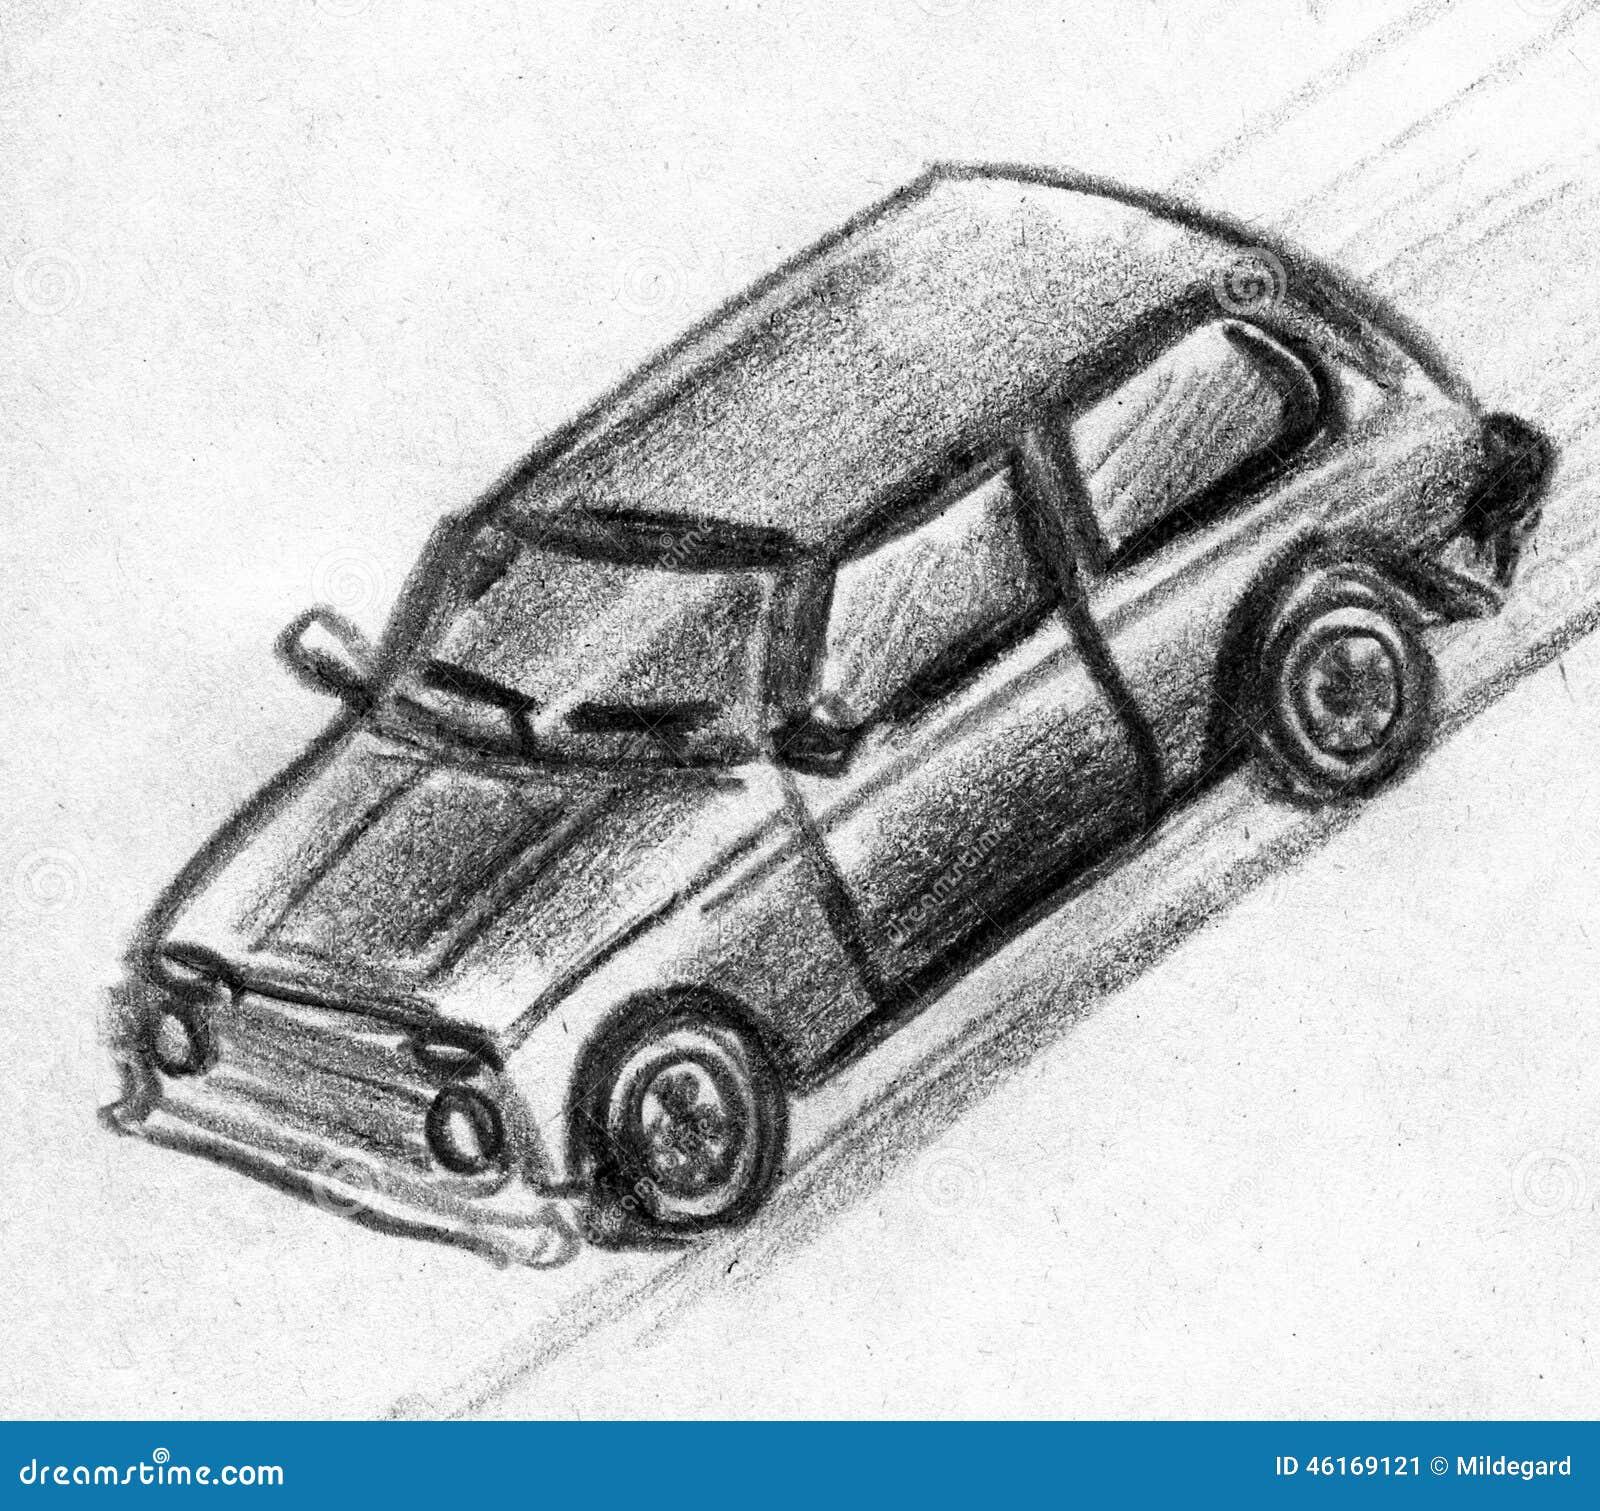 Toy car sketch stock illustration. Illustration of moving - 46169121